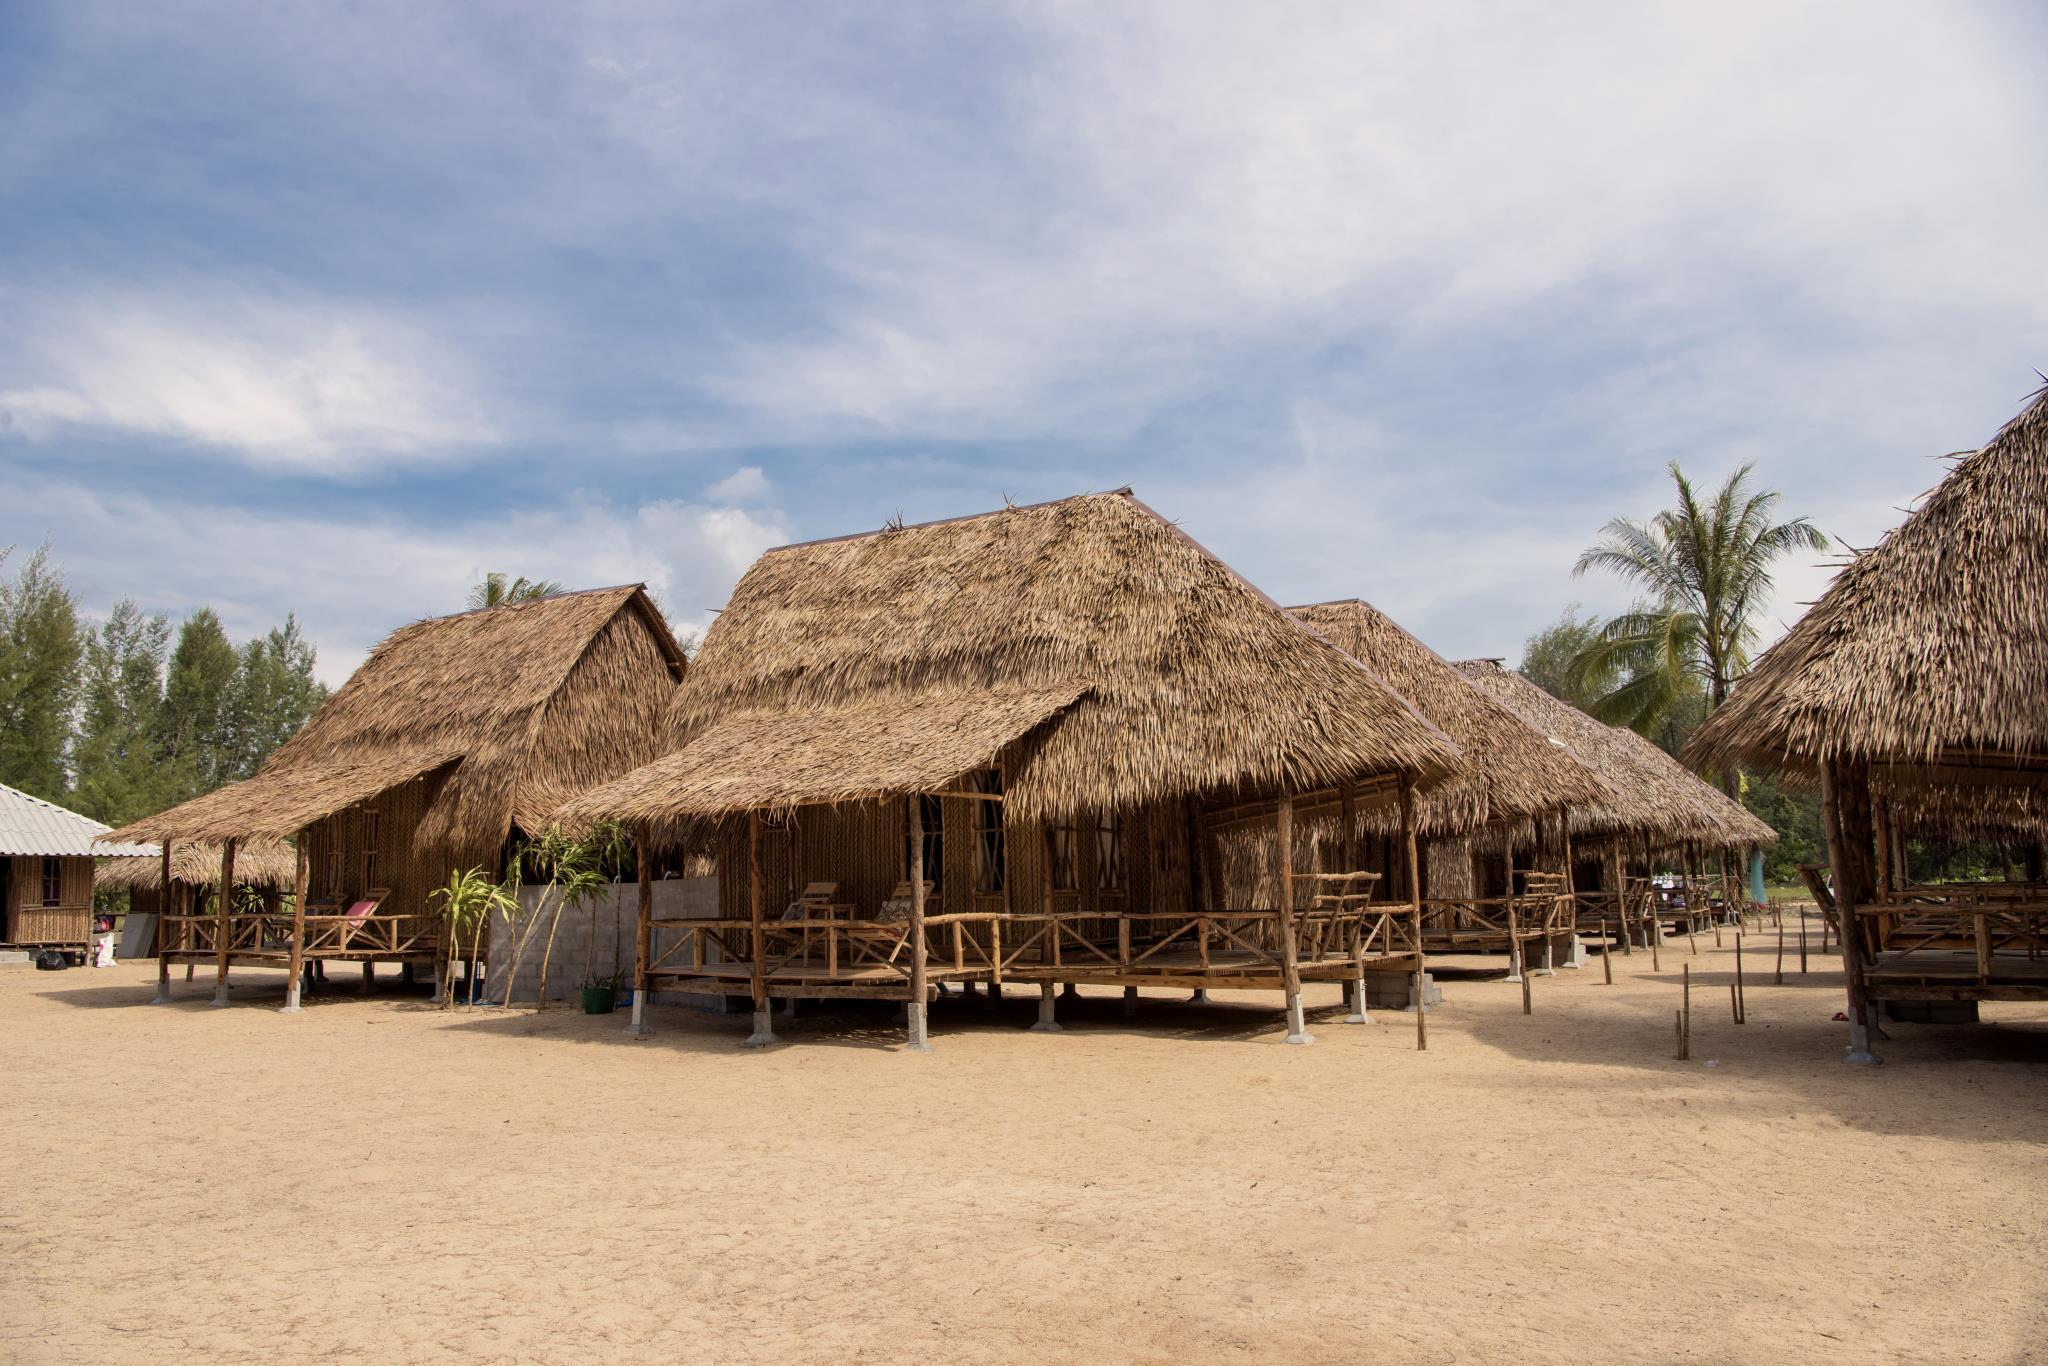 Kho Khao River Sand Resort,คอเขา ริเวอร์ แซนด์ รีสอร์ต